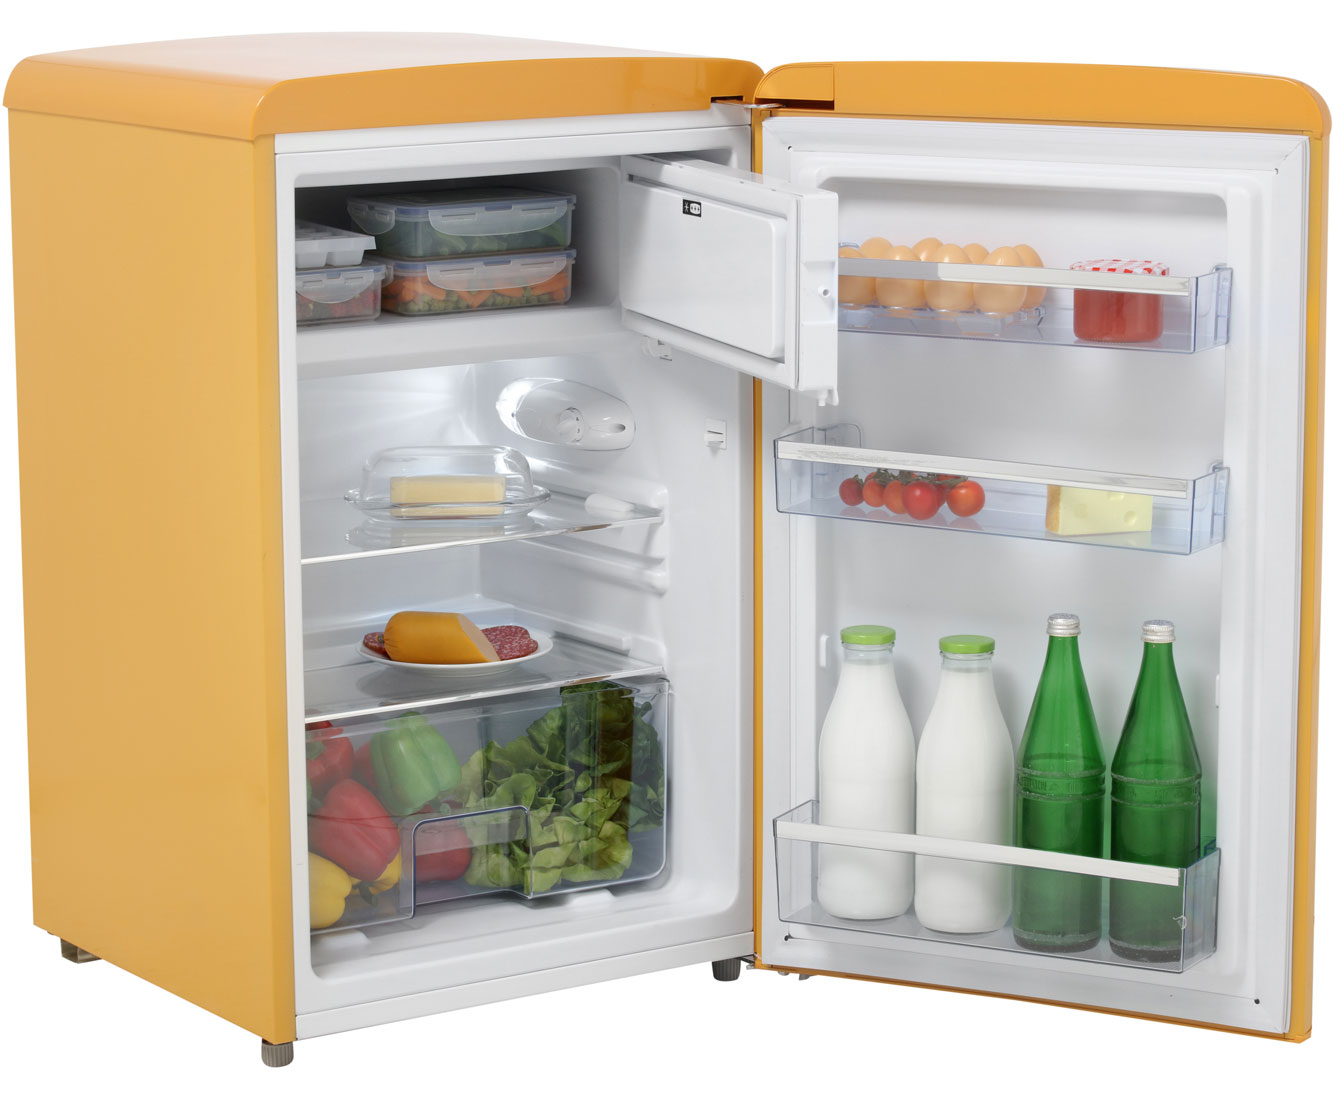 Amica Kühlschrank 55 Cm : Amica ks s kühlschrank retro design freistehend cm schwarz